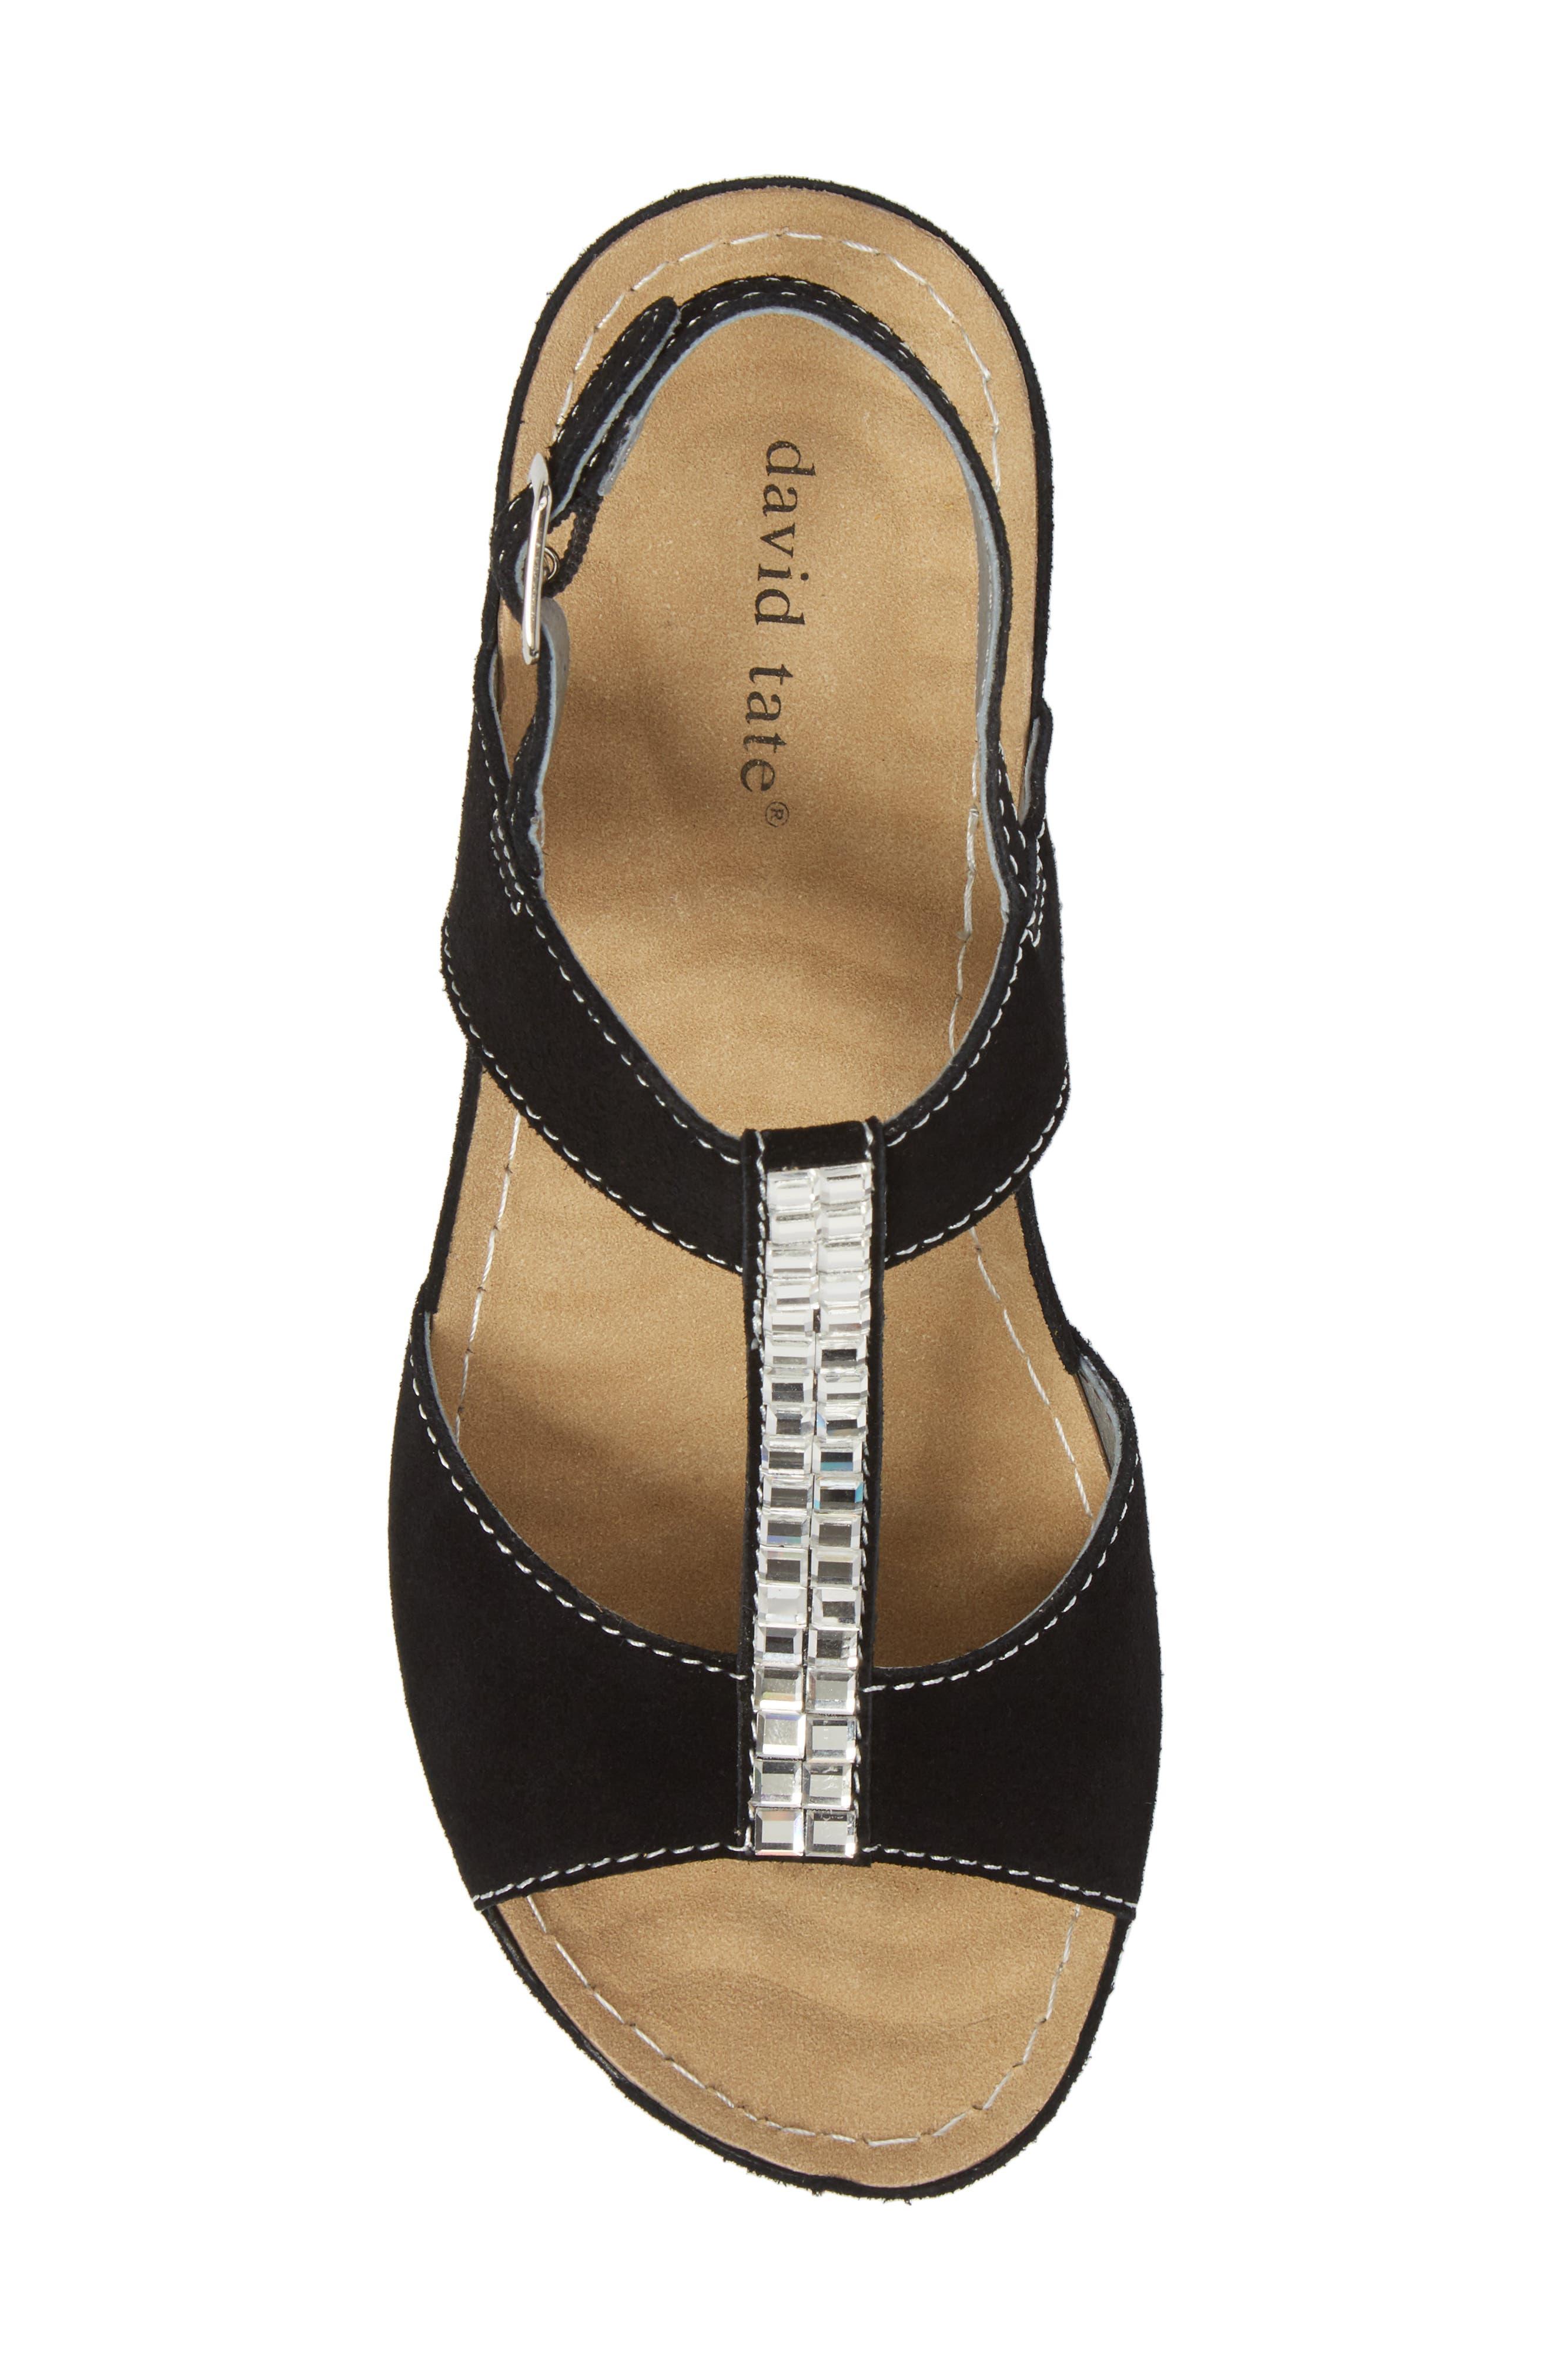 DAVID TATE, Bubbly Embellished T-Strap Wedge Sandal, Alternate thumbnail 5, color, BLACK SUEDE